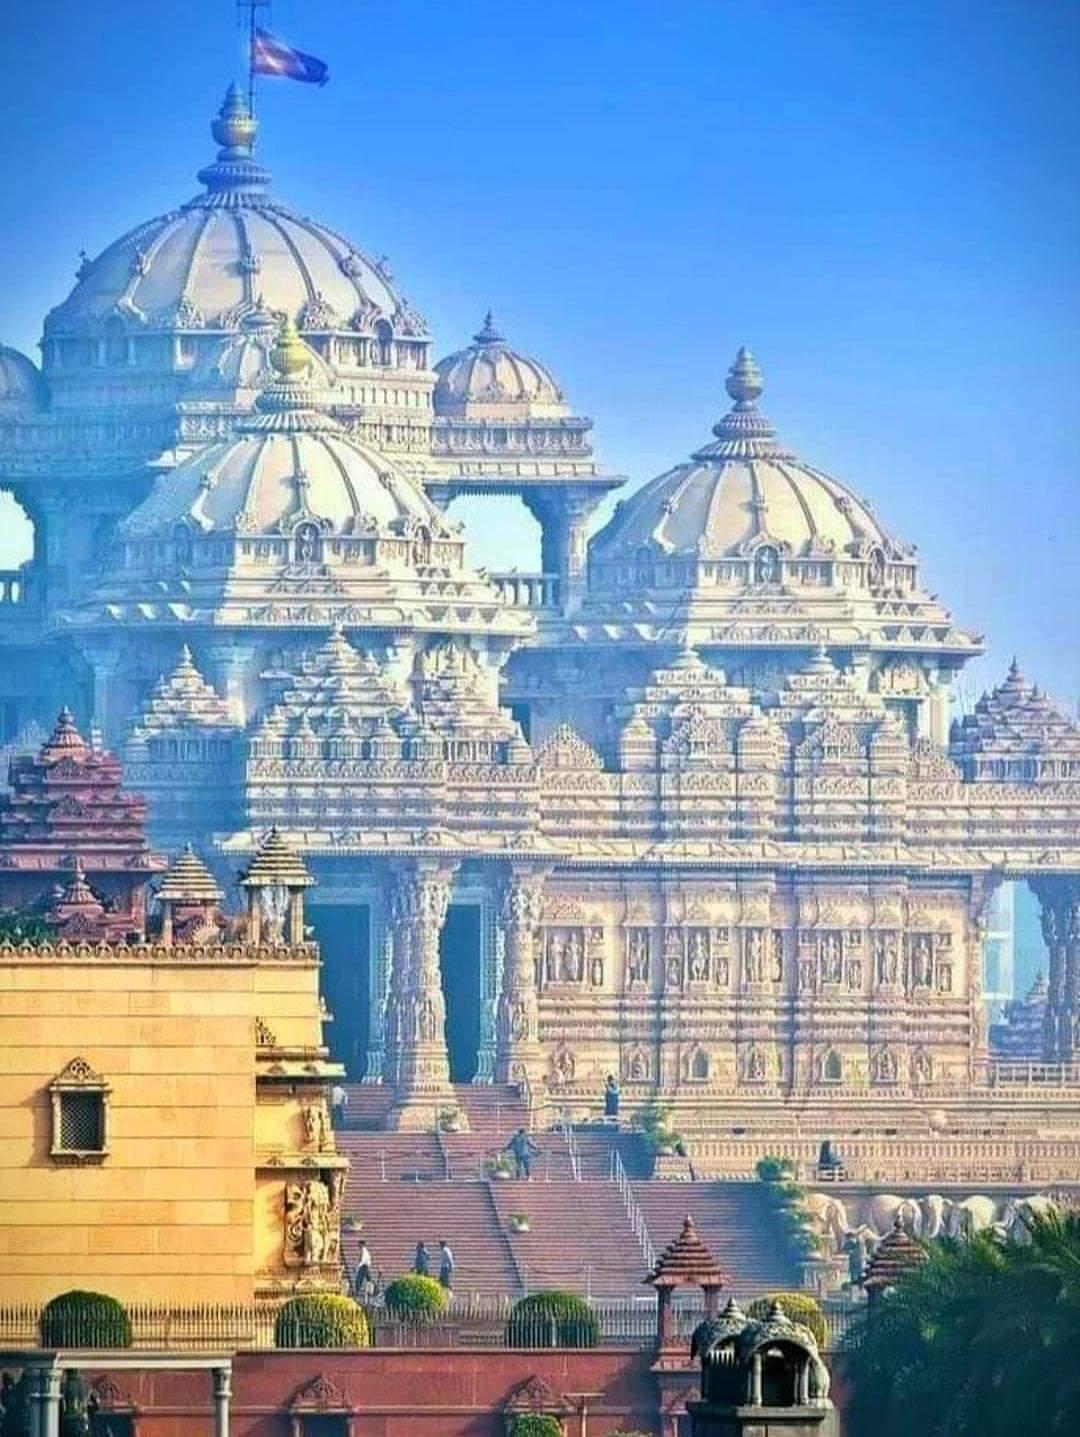 Beauty of Akshardham Temple, Delhi, India